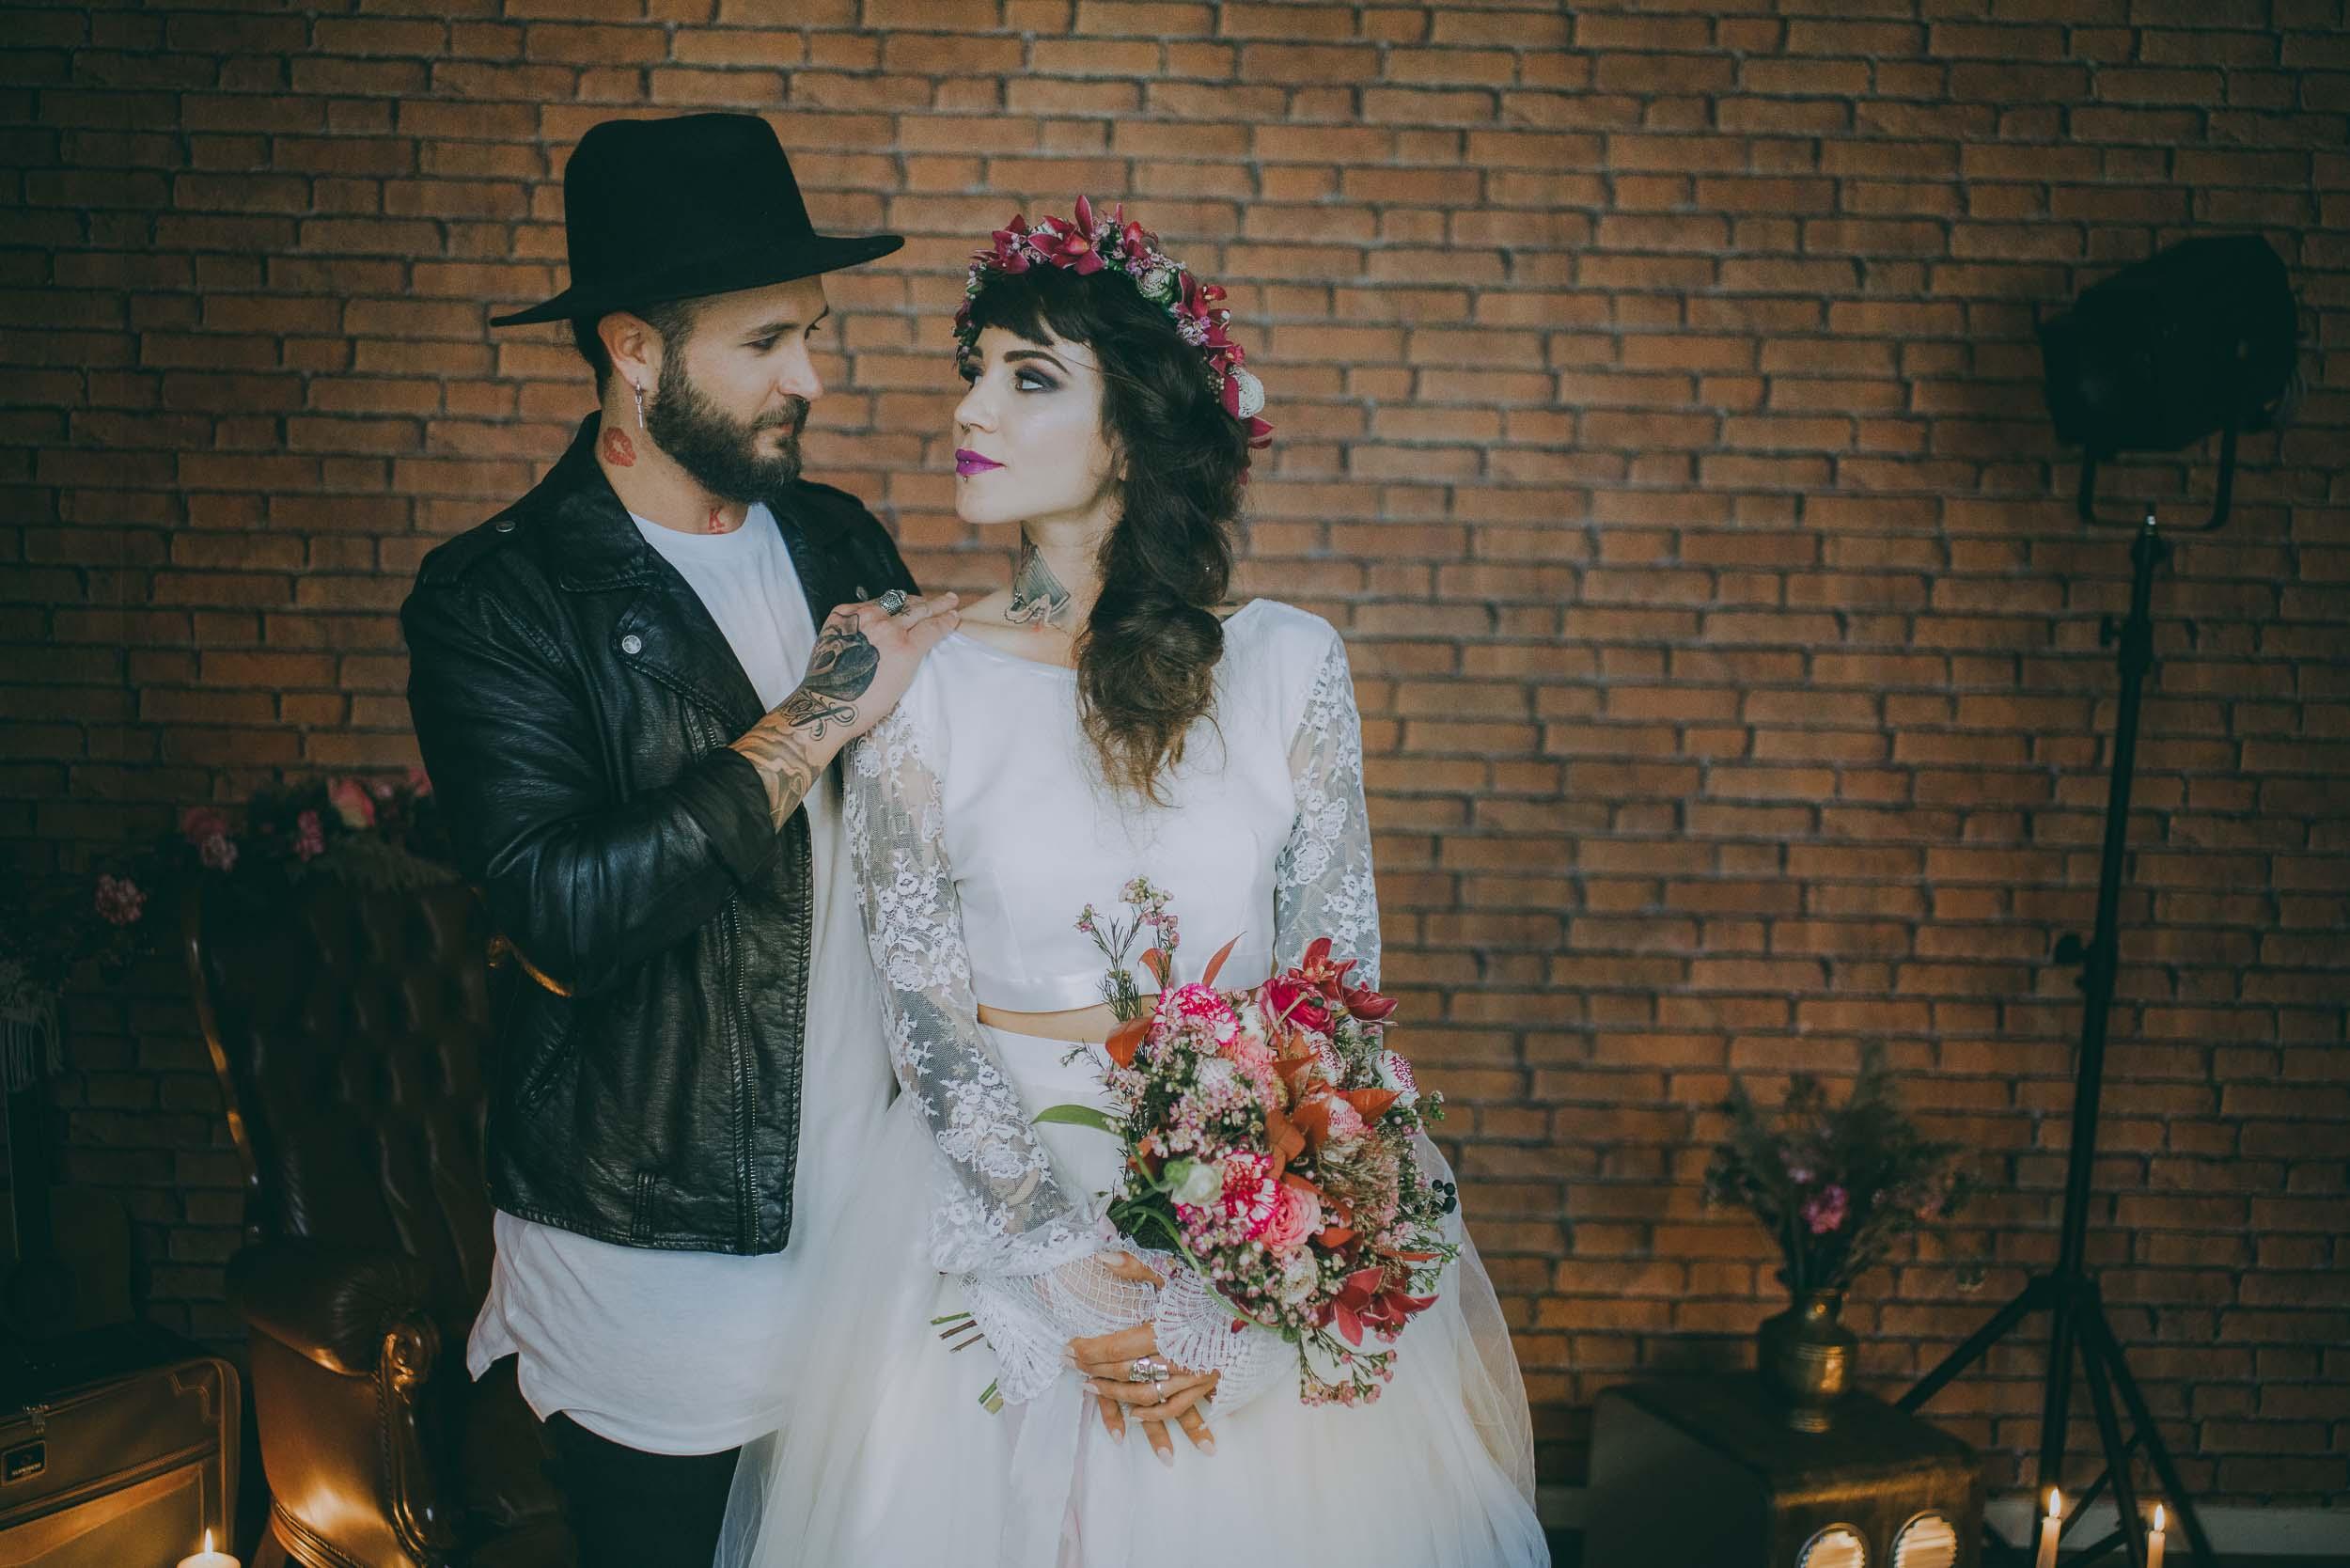 shooting inspiration mariage bohème rock photographe marseille - thomas bertini photography